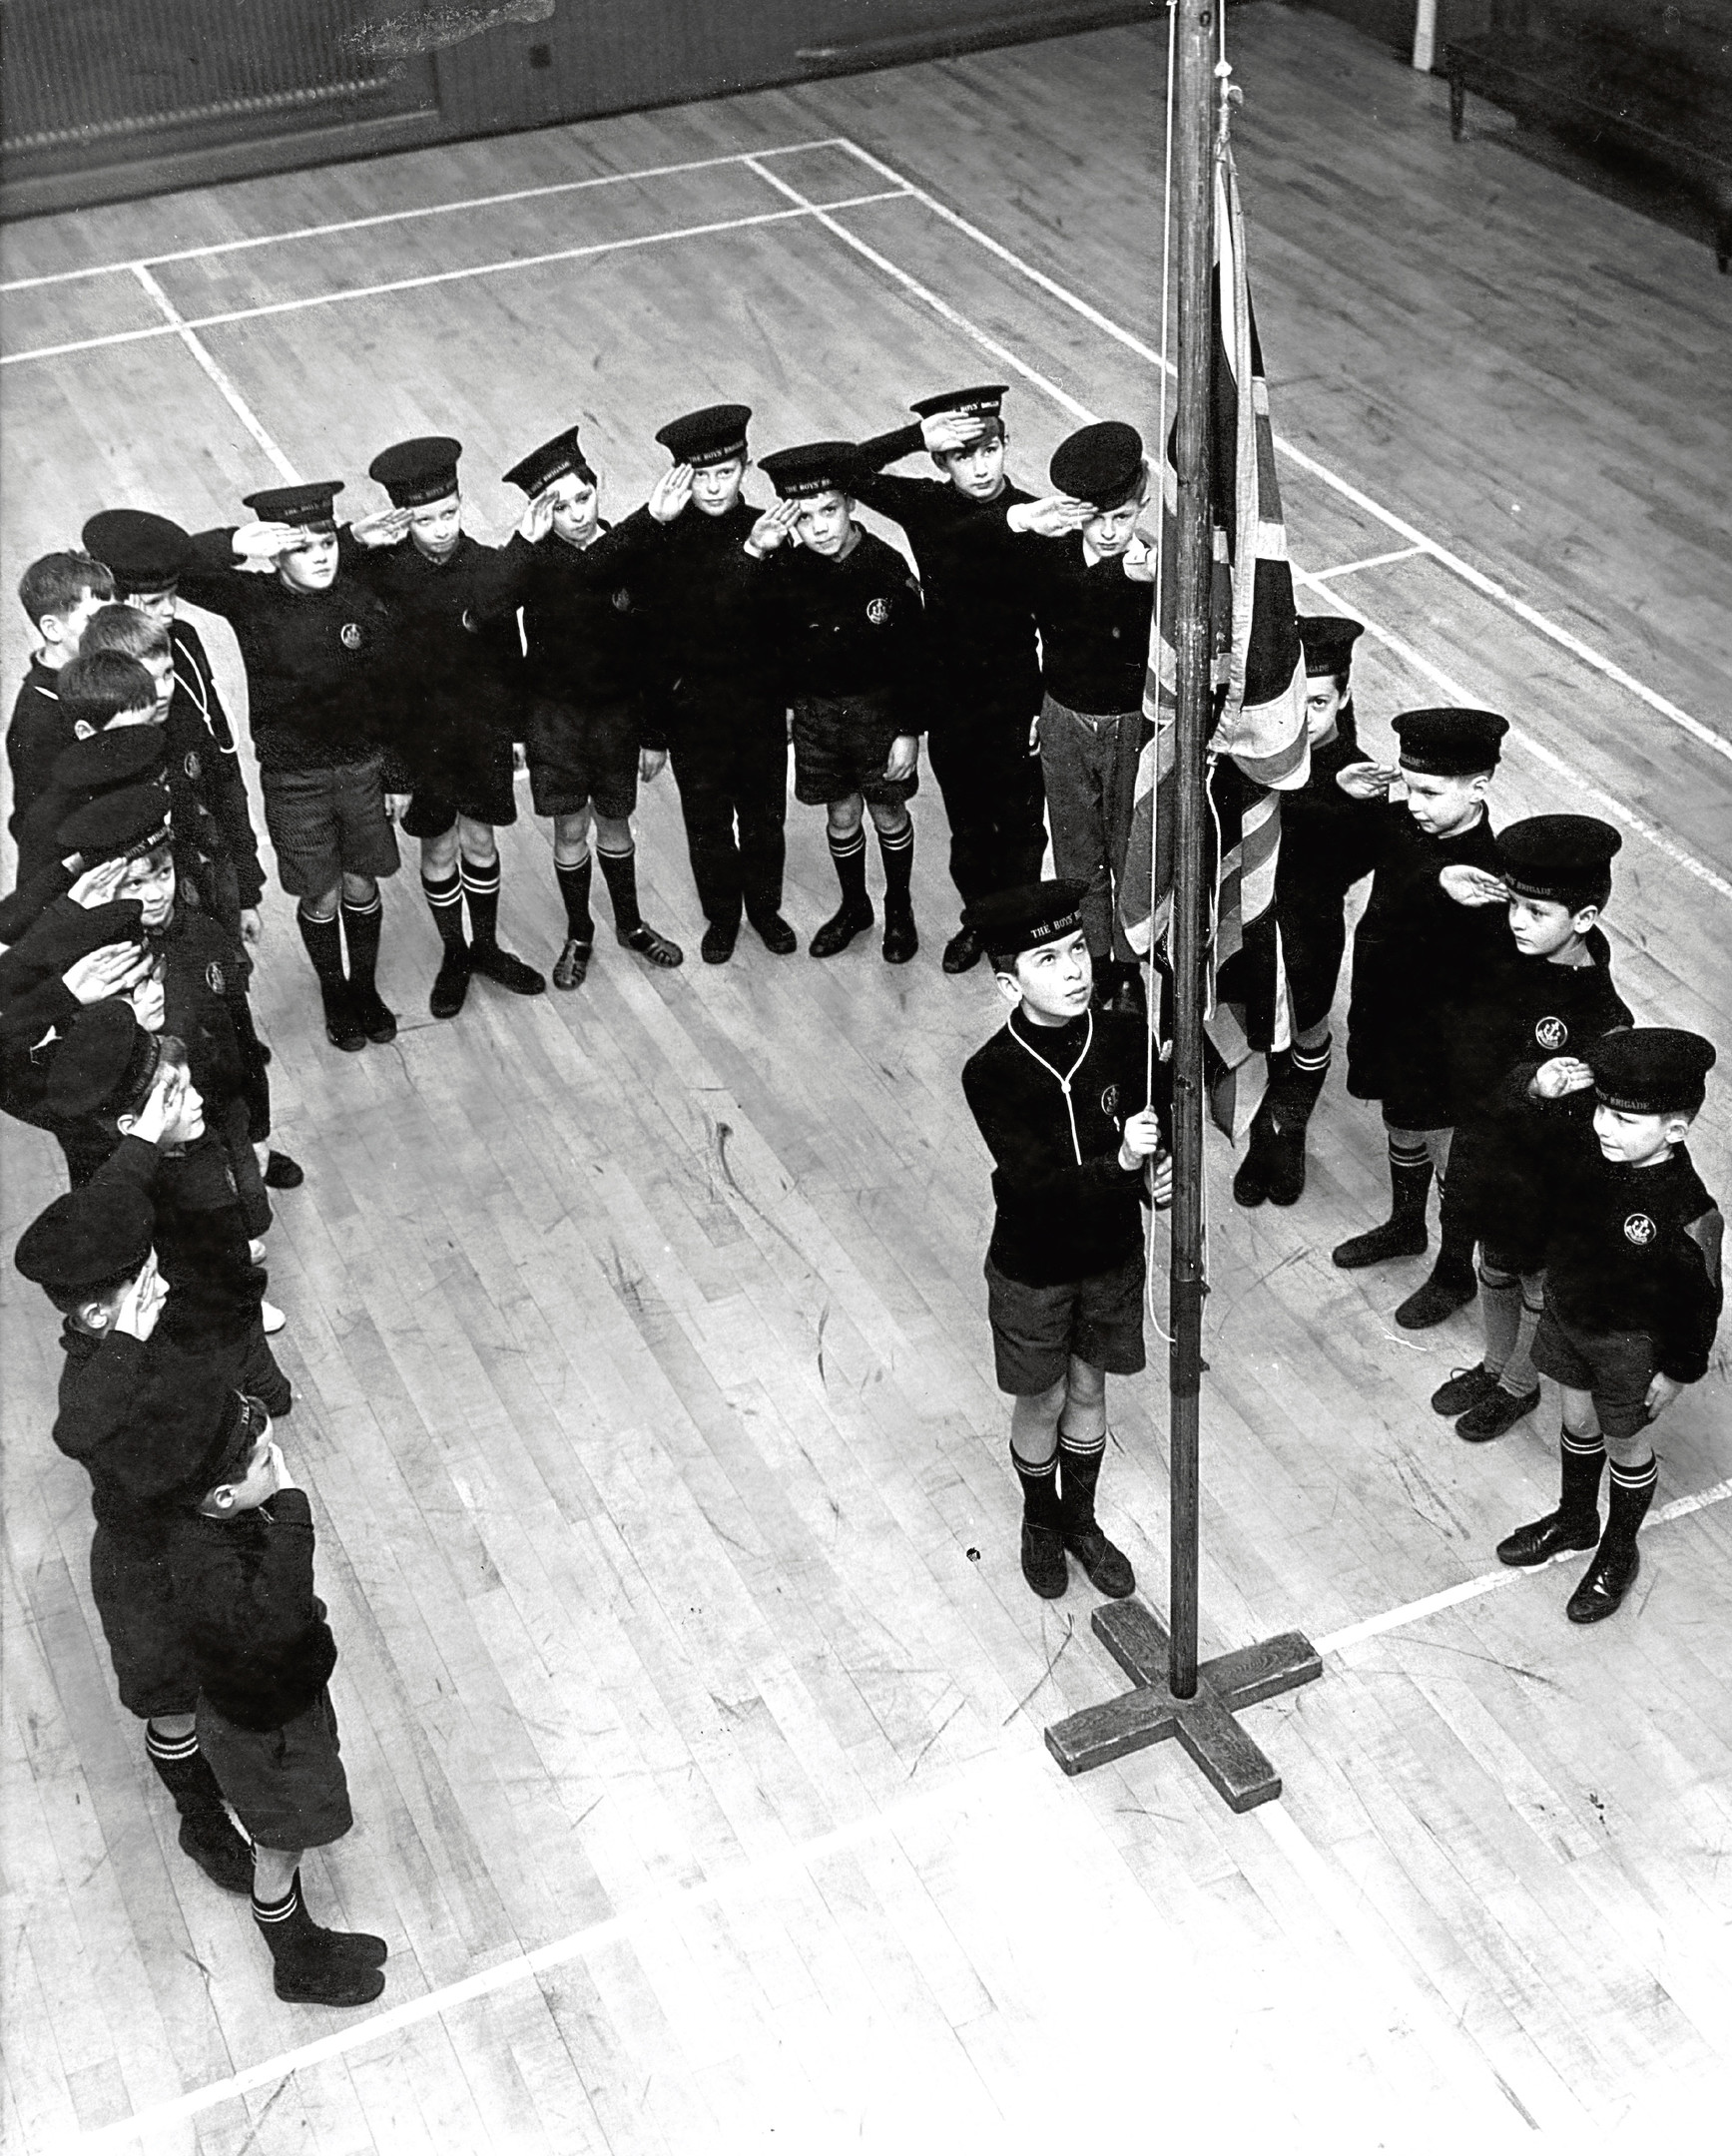 Boys of 9th Company Junior Boys' Brigade (Ruthrieston South Church) practice the flag raising.